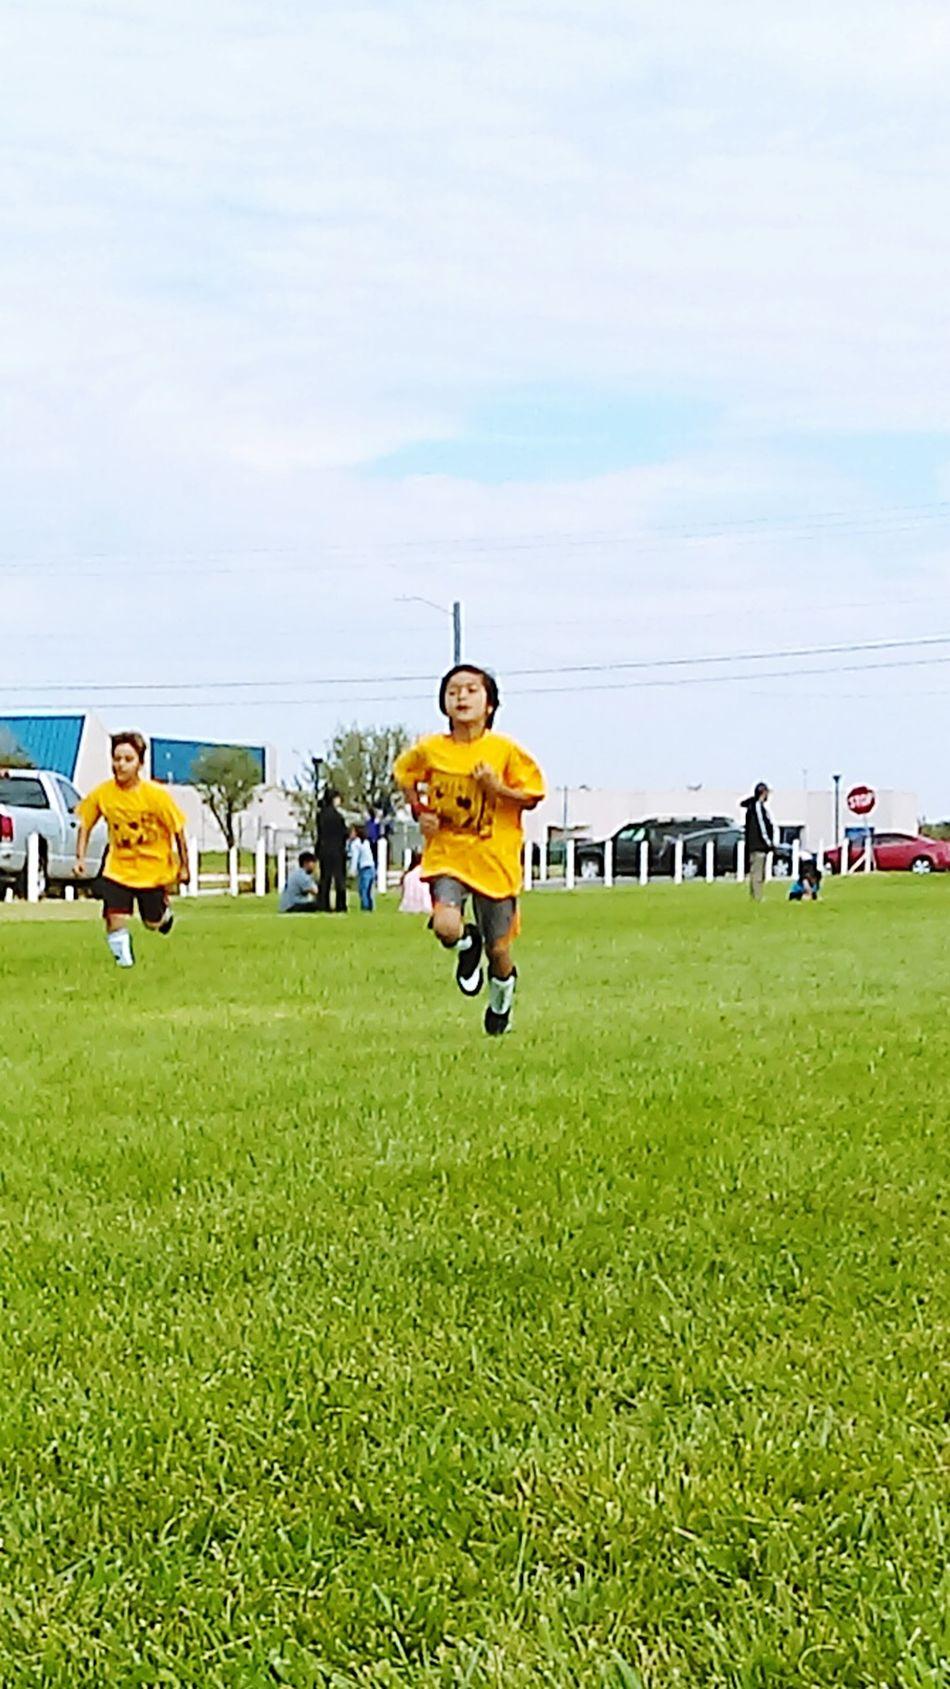 Soccer Soccer Life Soccer Game Nice Day Green Grass Blue Sky Sunshine Warm Ups Laps Thats My Boy !